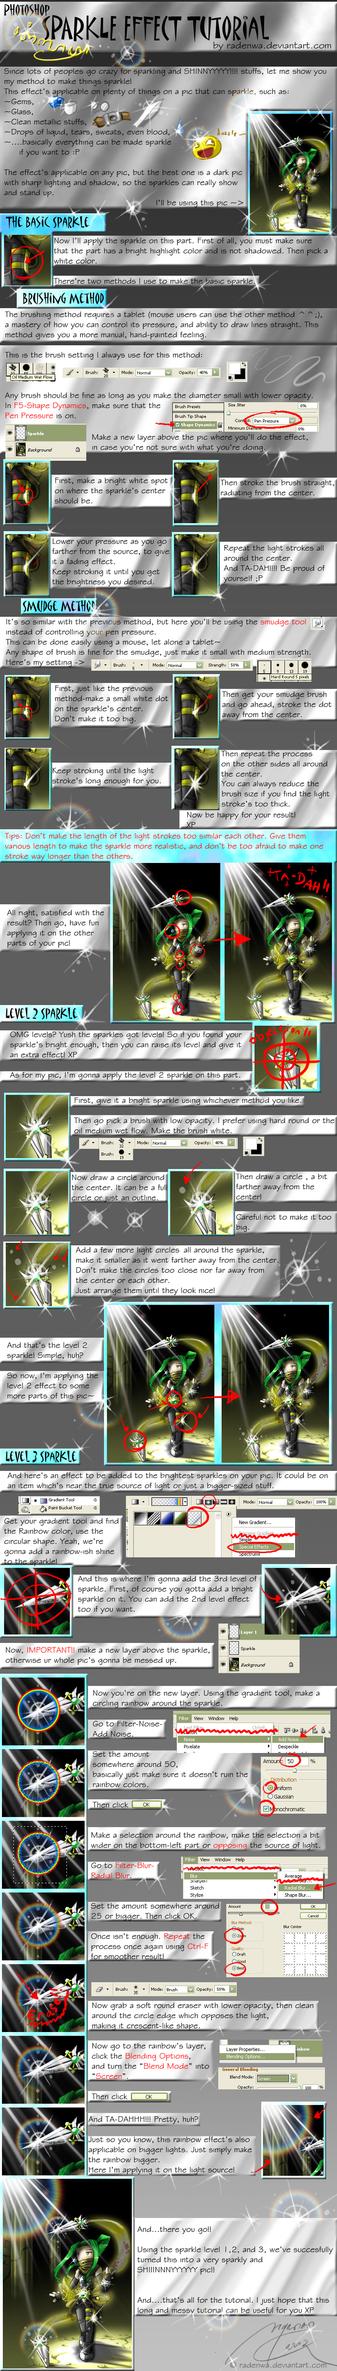 PS Sparkle Effect Tutorial by RadenWA